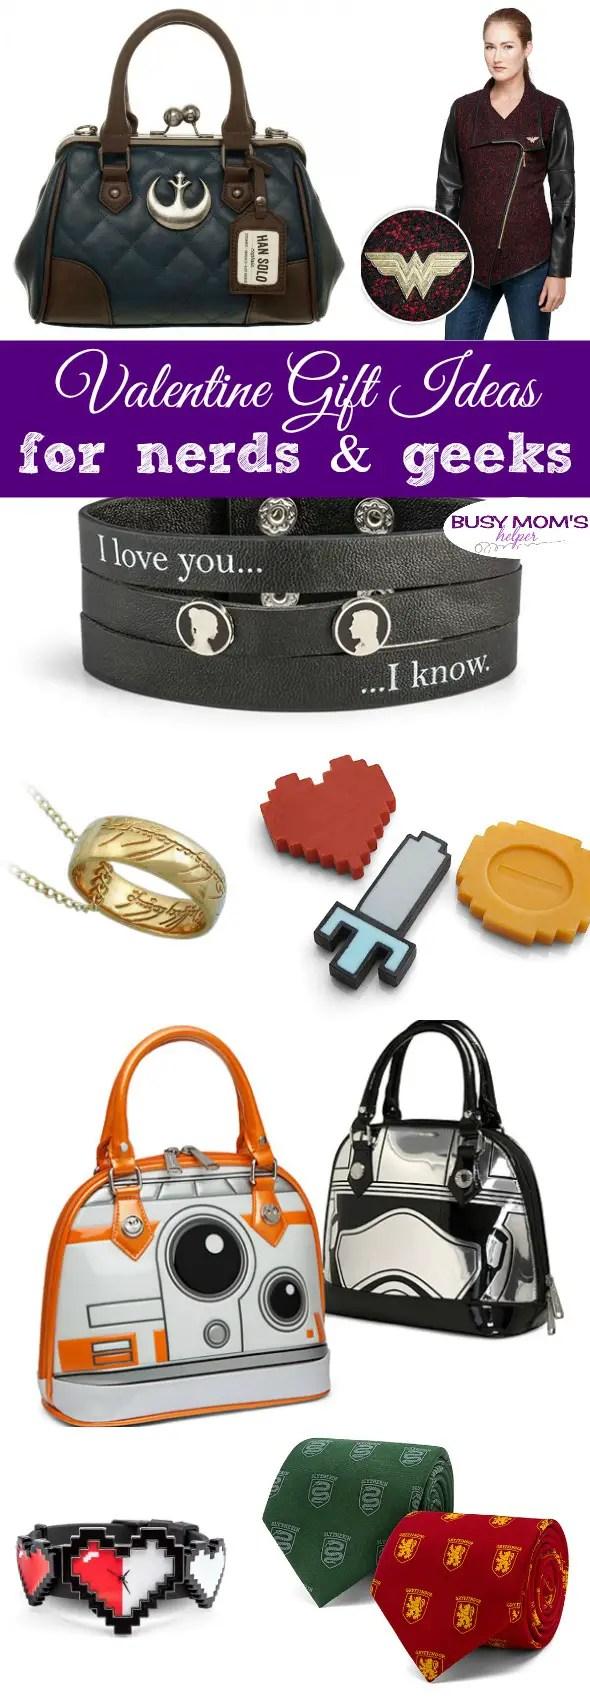 Valentine's Day Must Haves for Geeks #starwars #nerd #geek #valentinesday #valentinegift #holiday